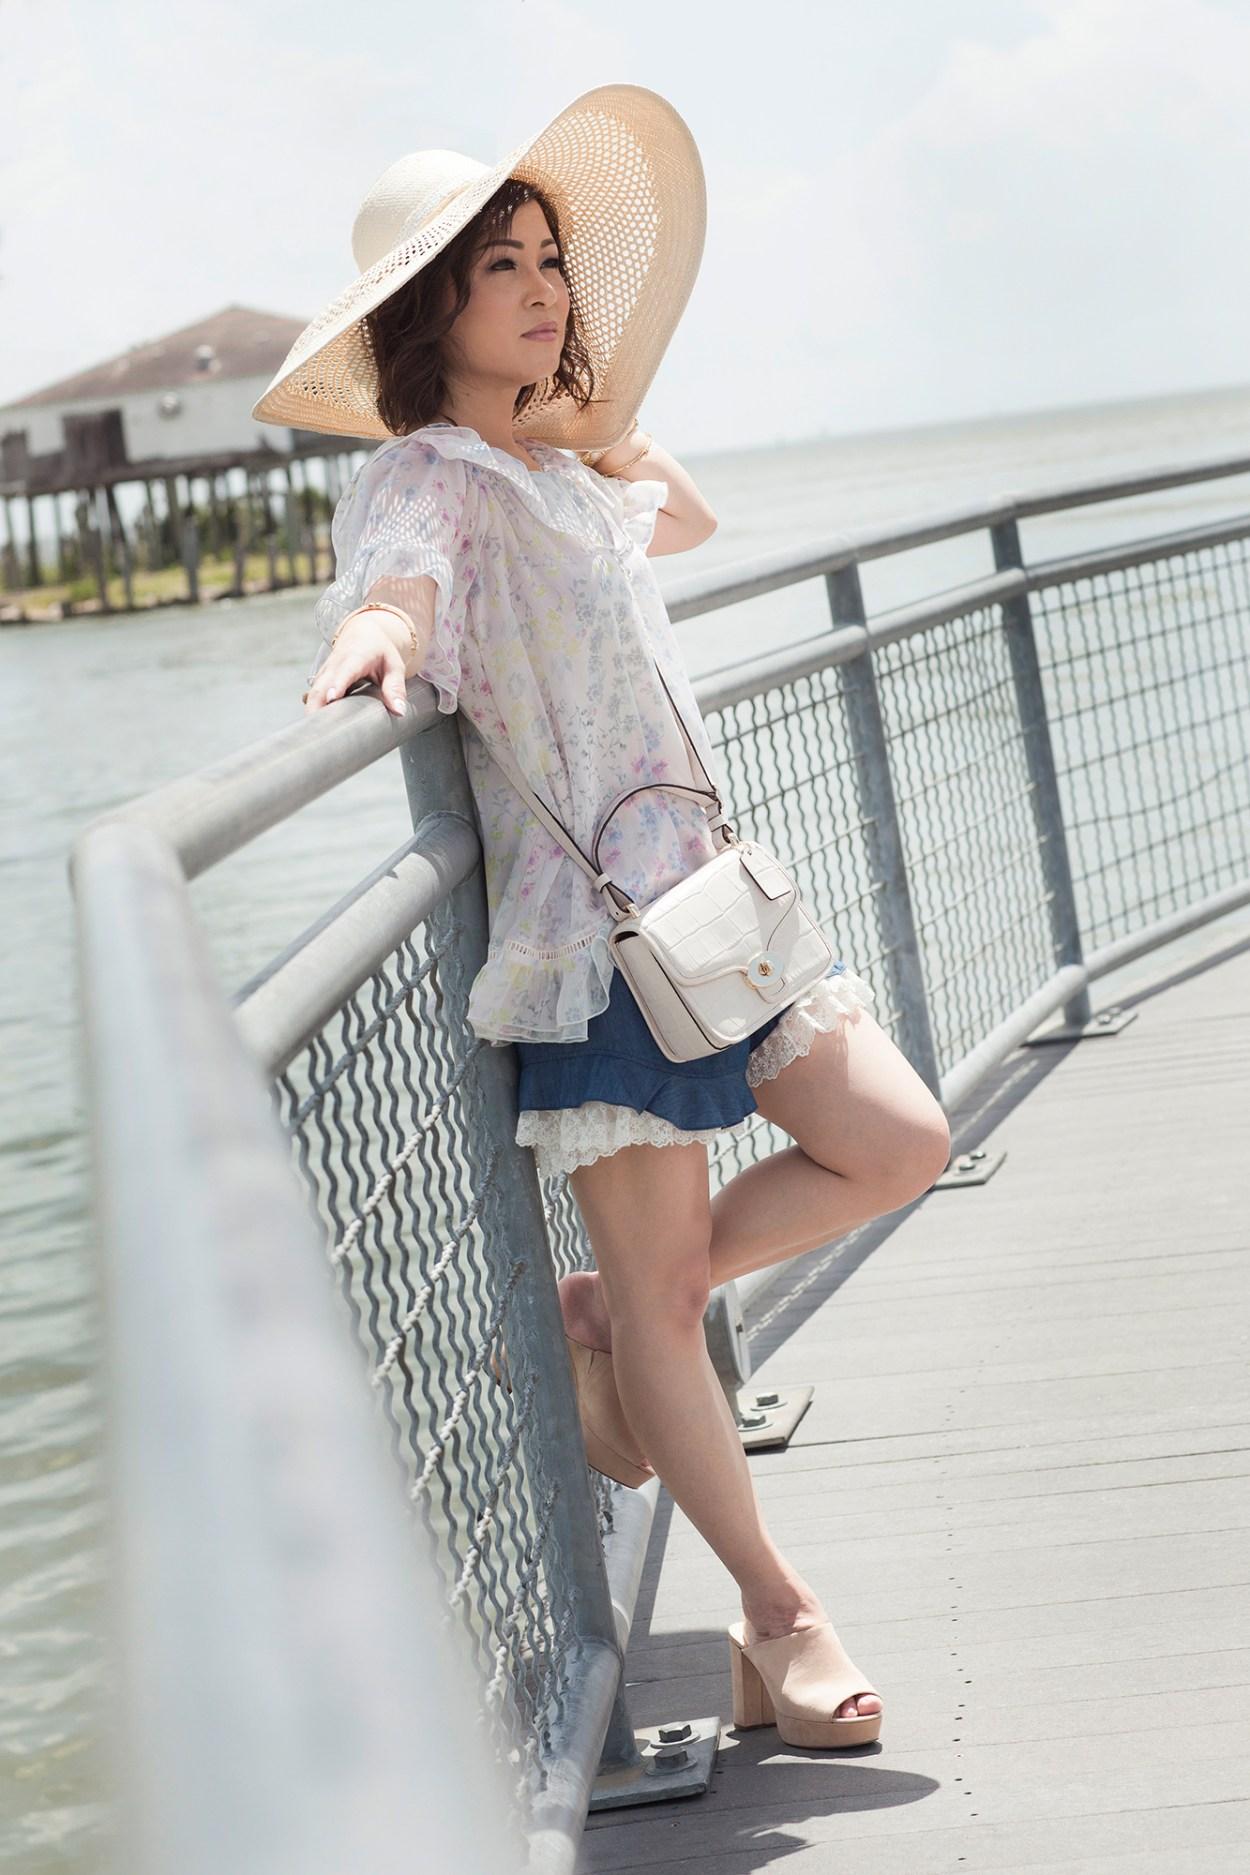 9-Liz-Lisa-Fashion-Women-Summer-Style-Trend-Kemah.jpg